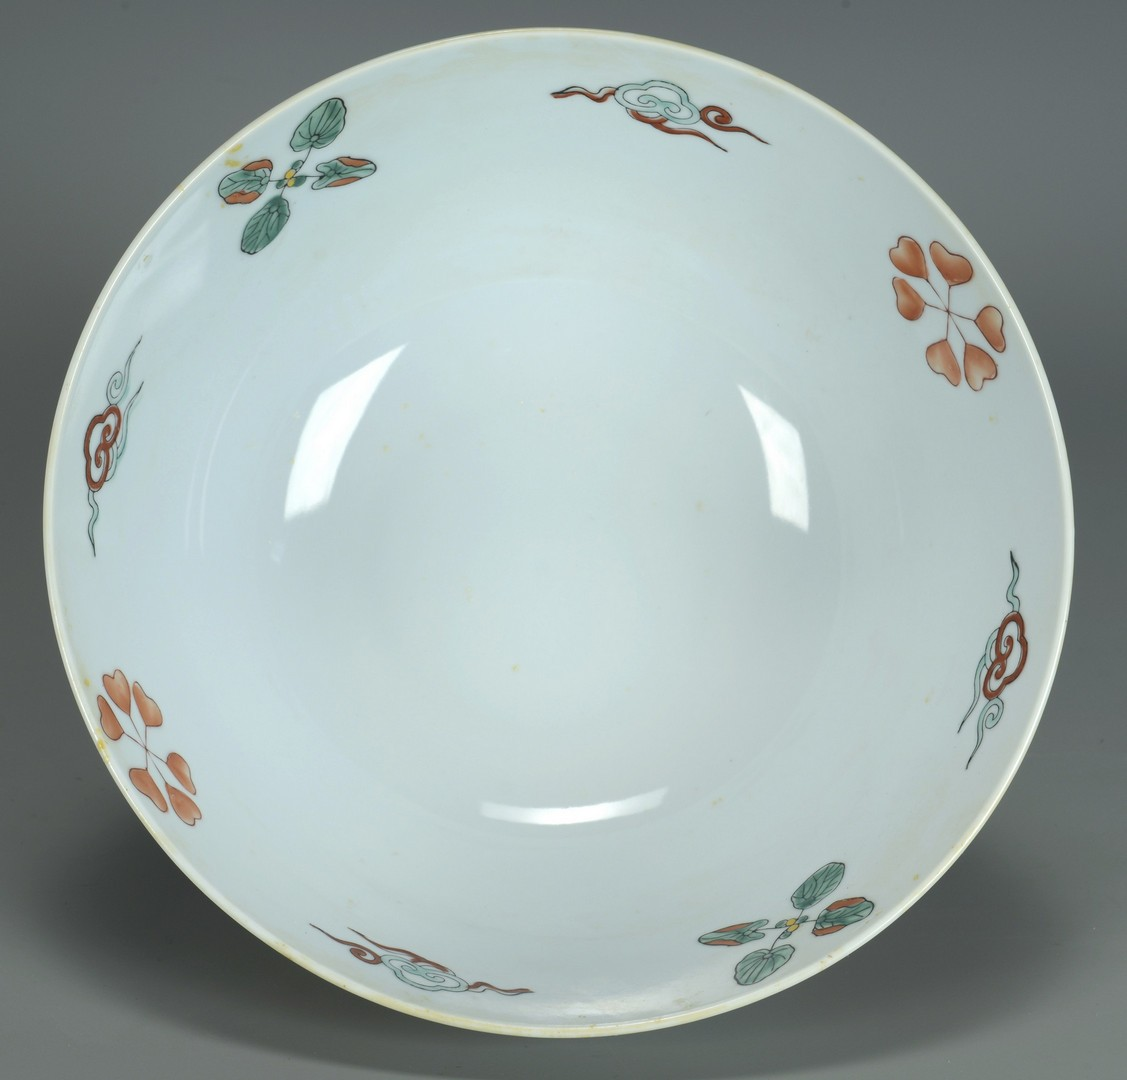 Lot 3832465: Chinese Fish Bowl; Jardiniere